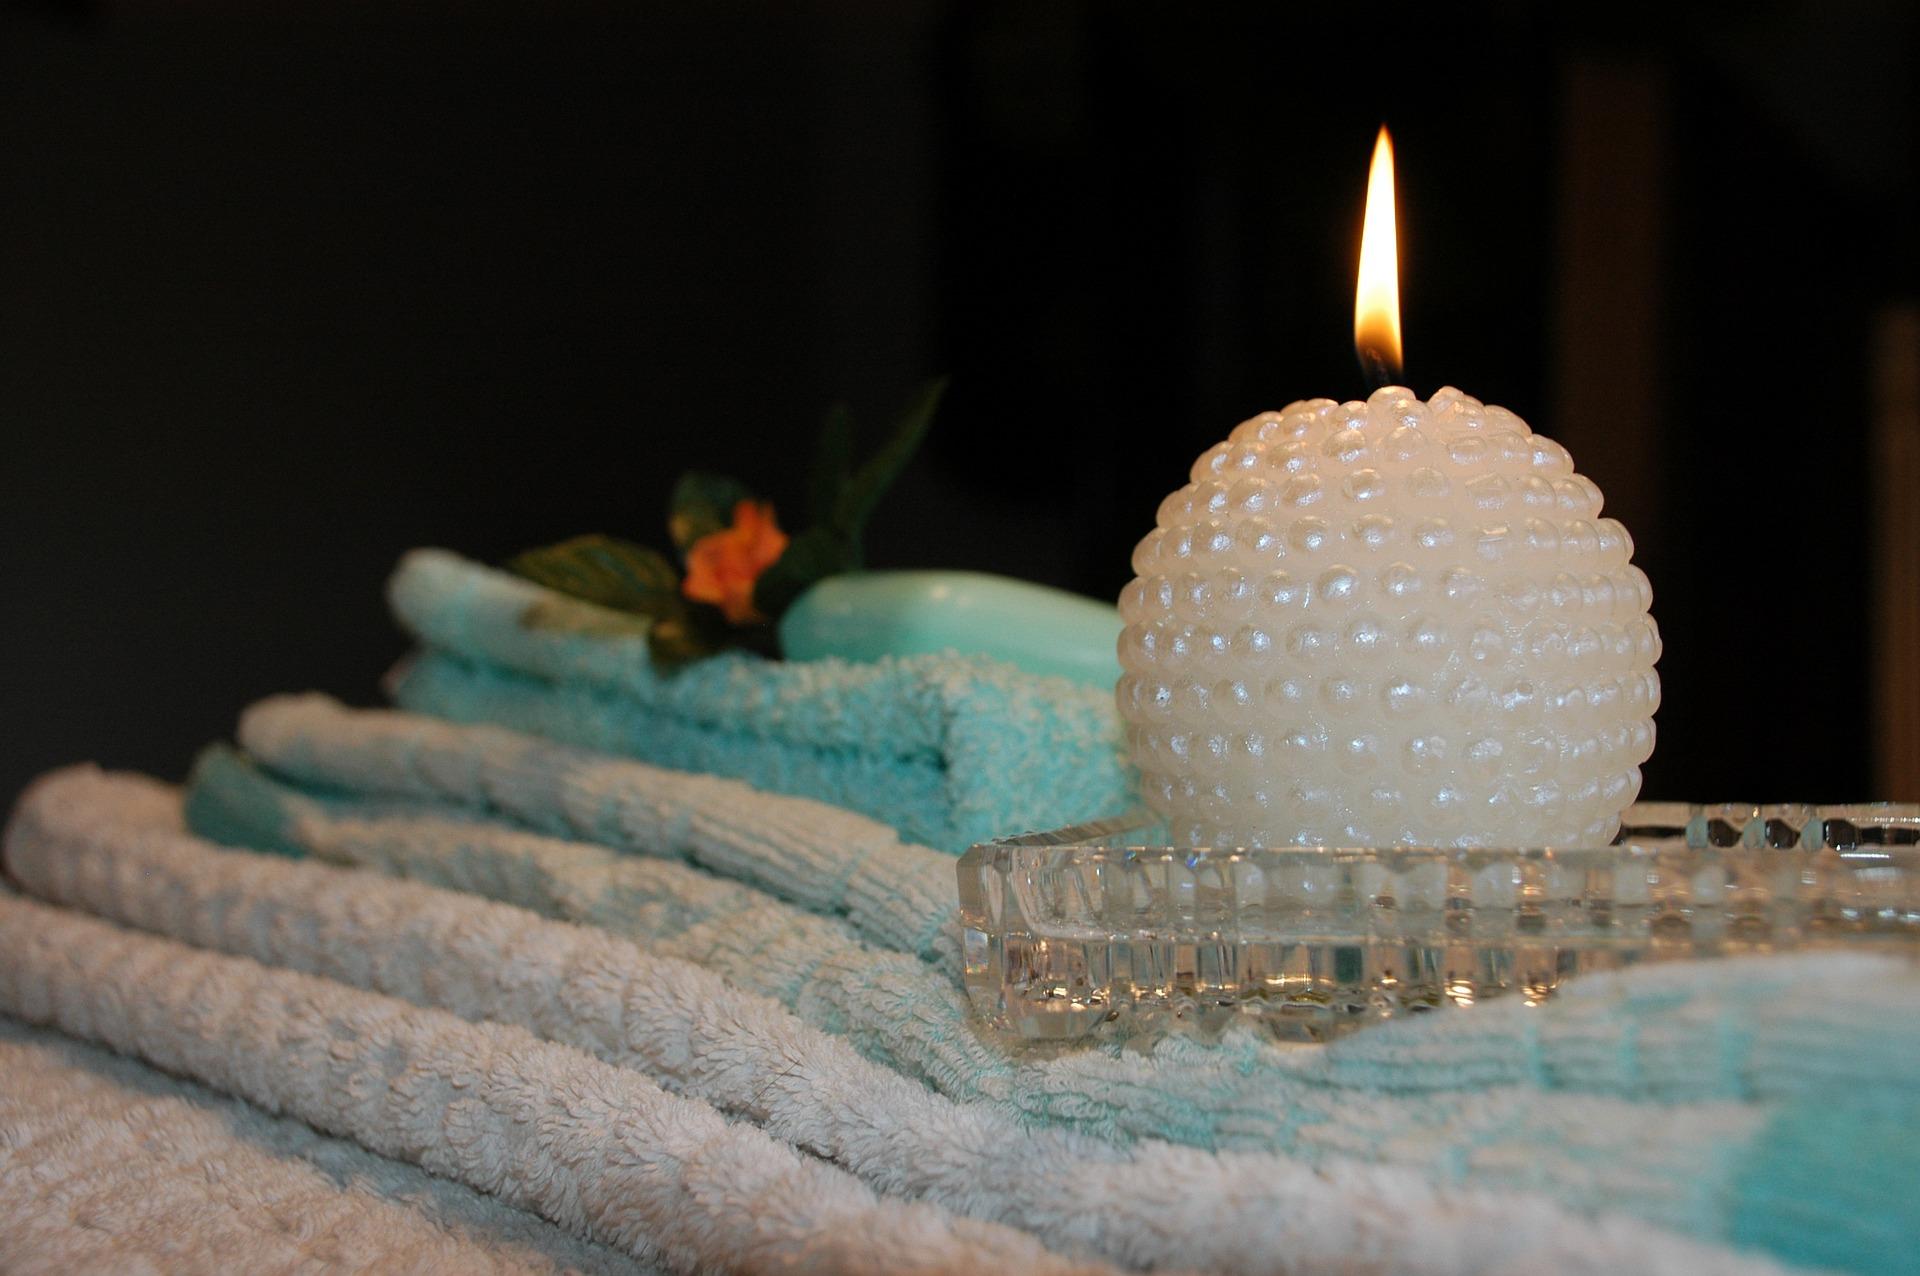 candle-807247_1920